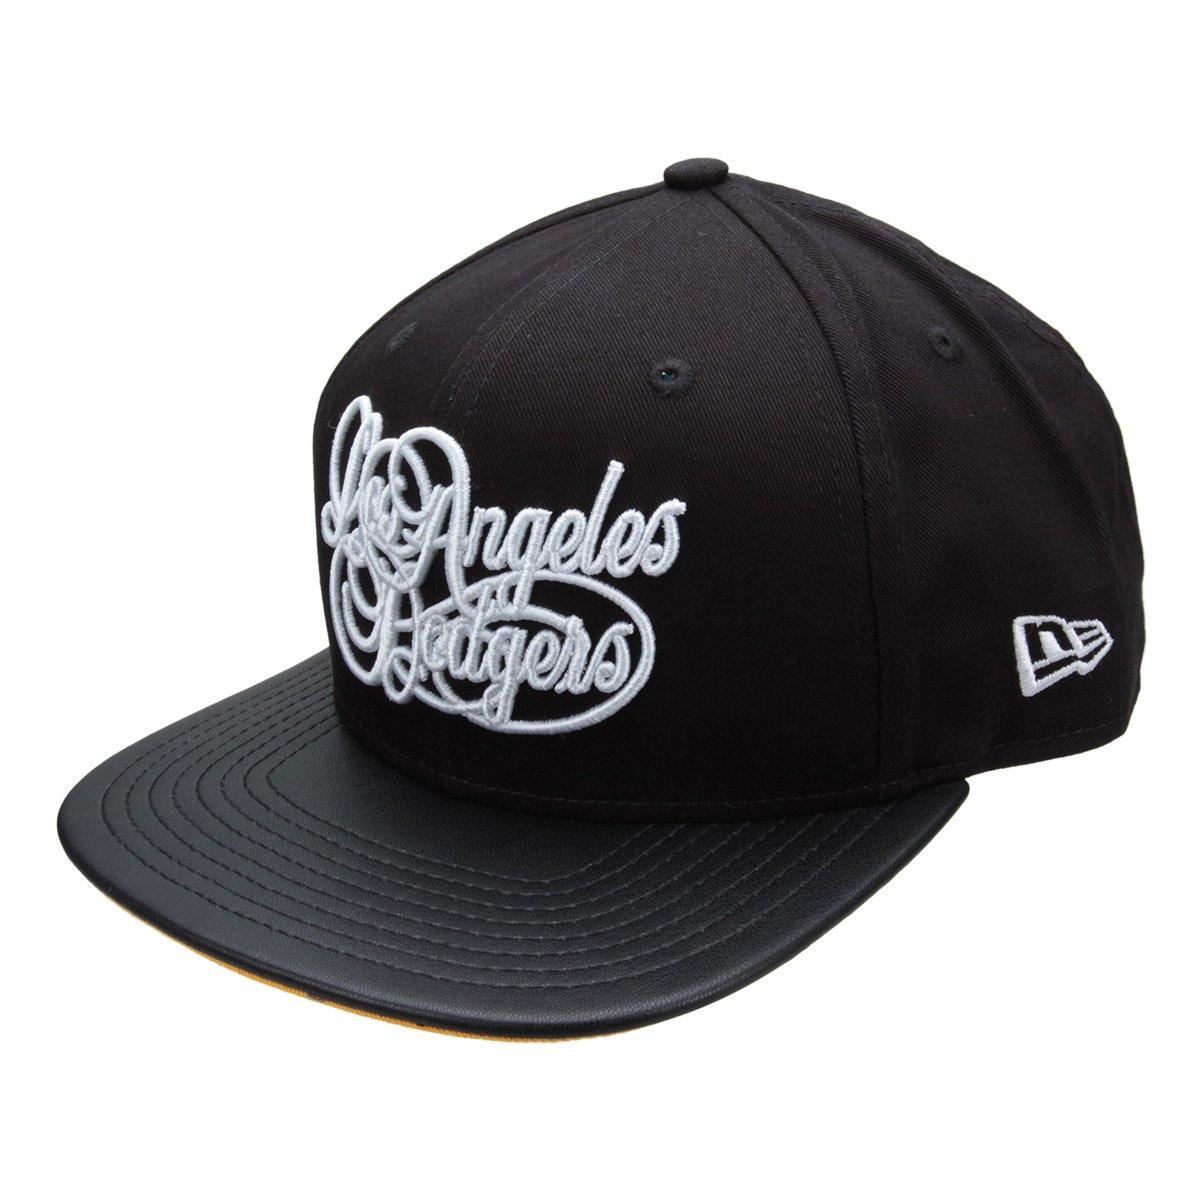 aa569f9ff0cc2 Boné New Era MLB Los Angeles Dodgers Aba Reta 950 Of Sn Scrit - Preto -  Compre Agora